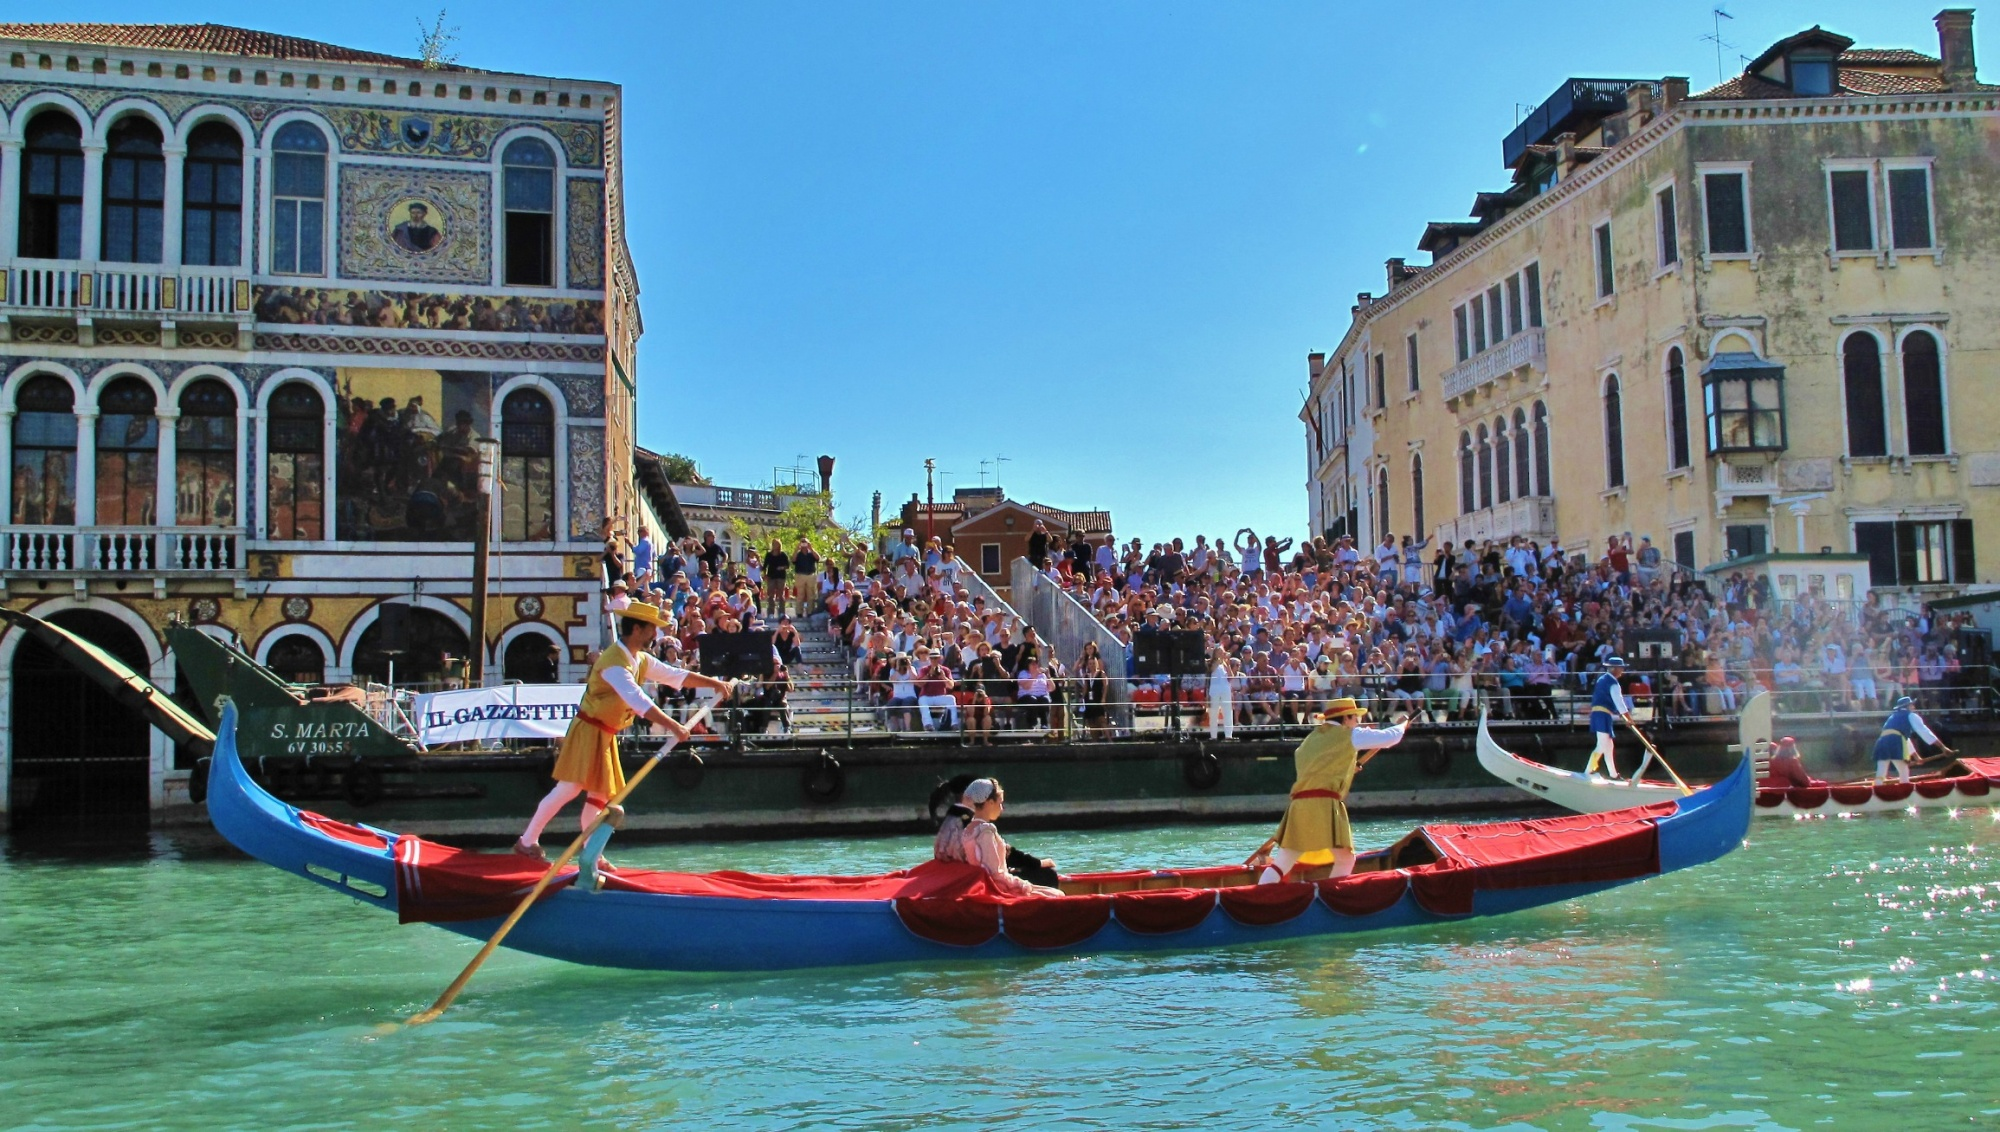 regata-storica-2019-venezia-topsecret